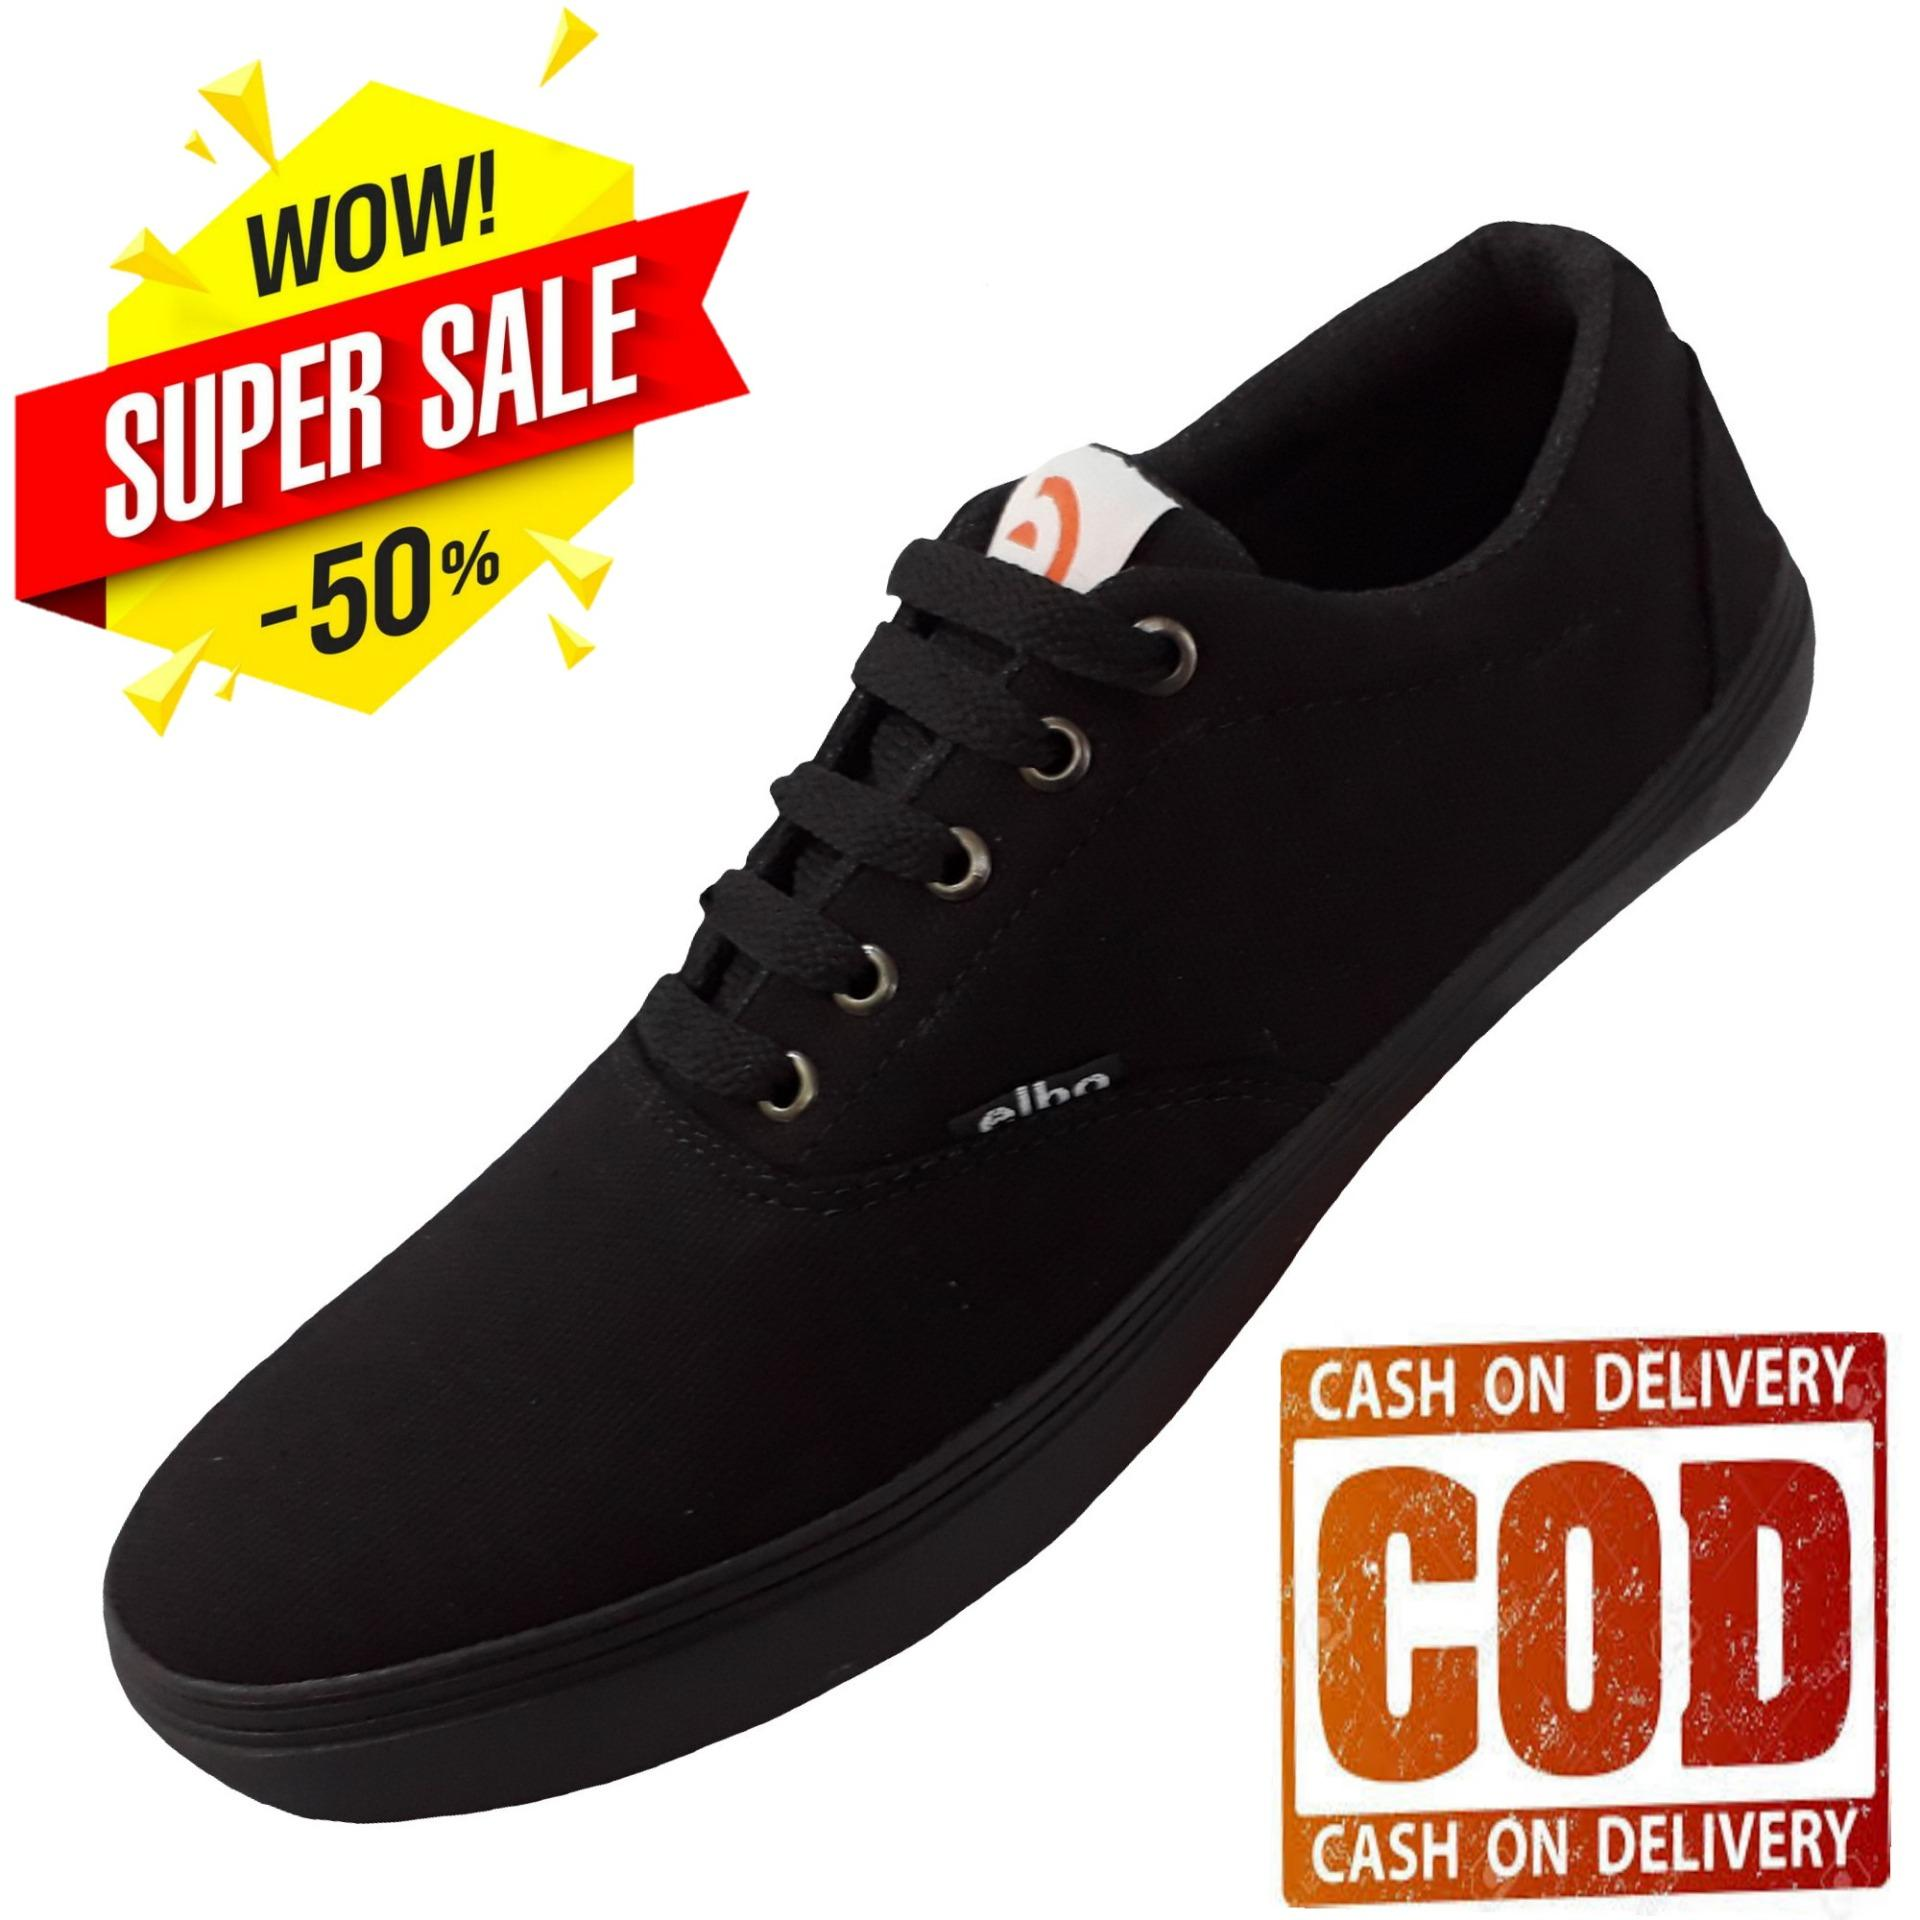 Sepatu Santai Pria Trendi Sneaker Casual - Hitam ea73f9243f